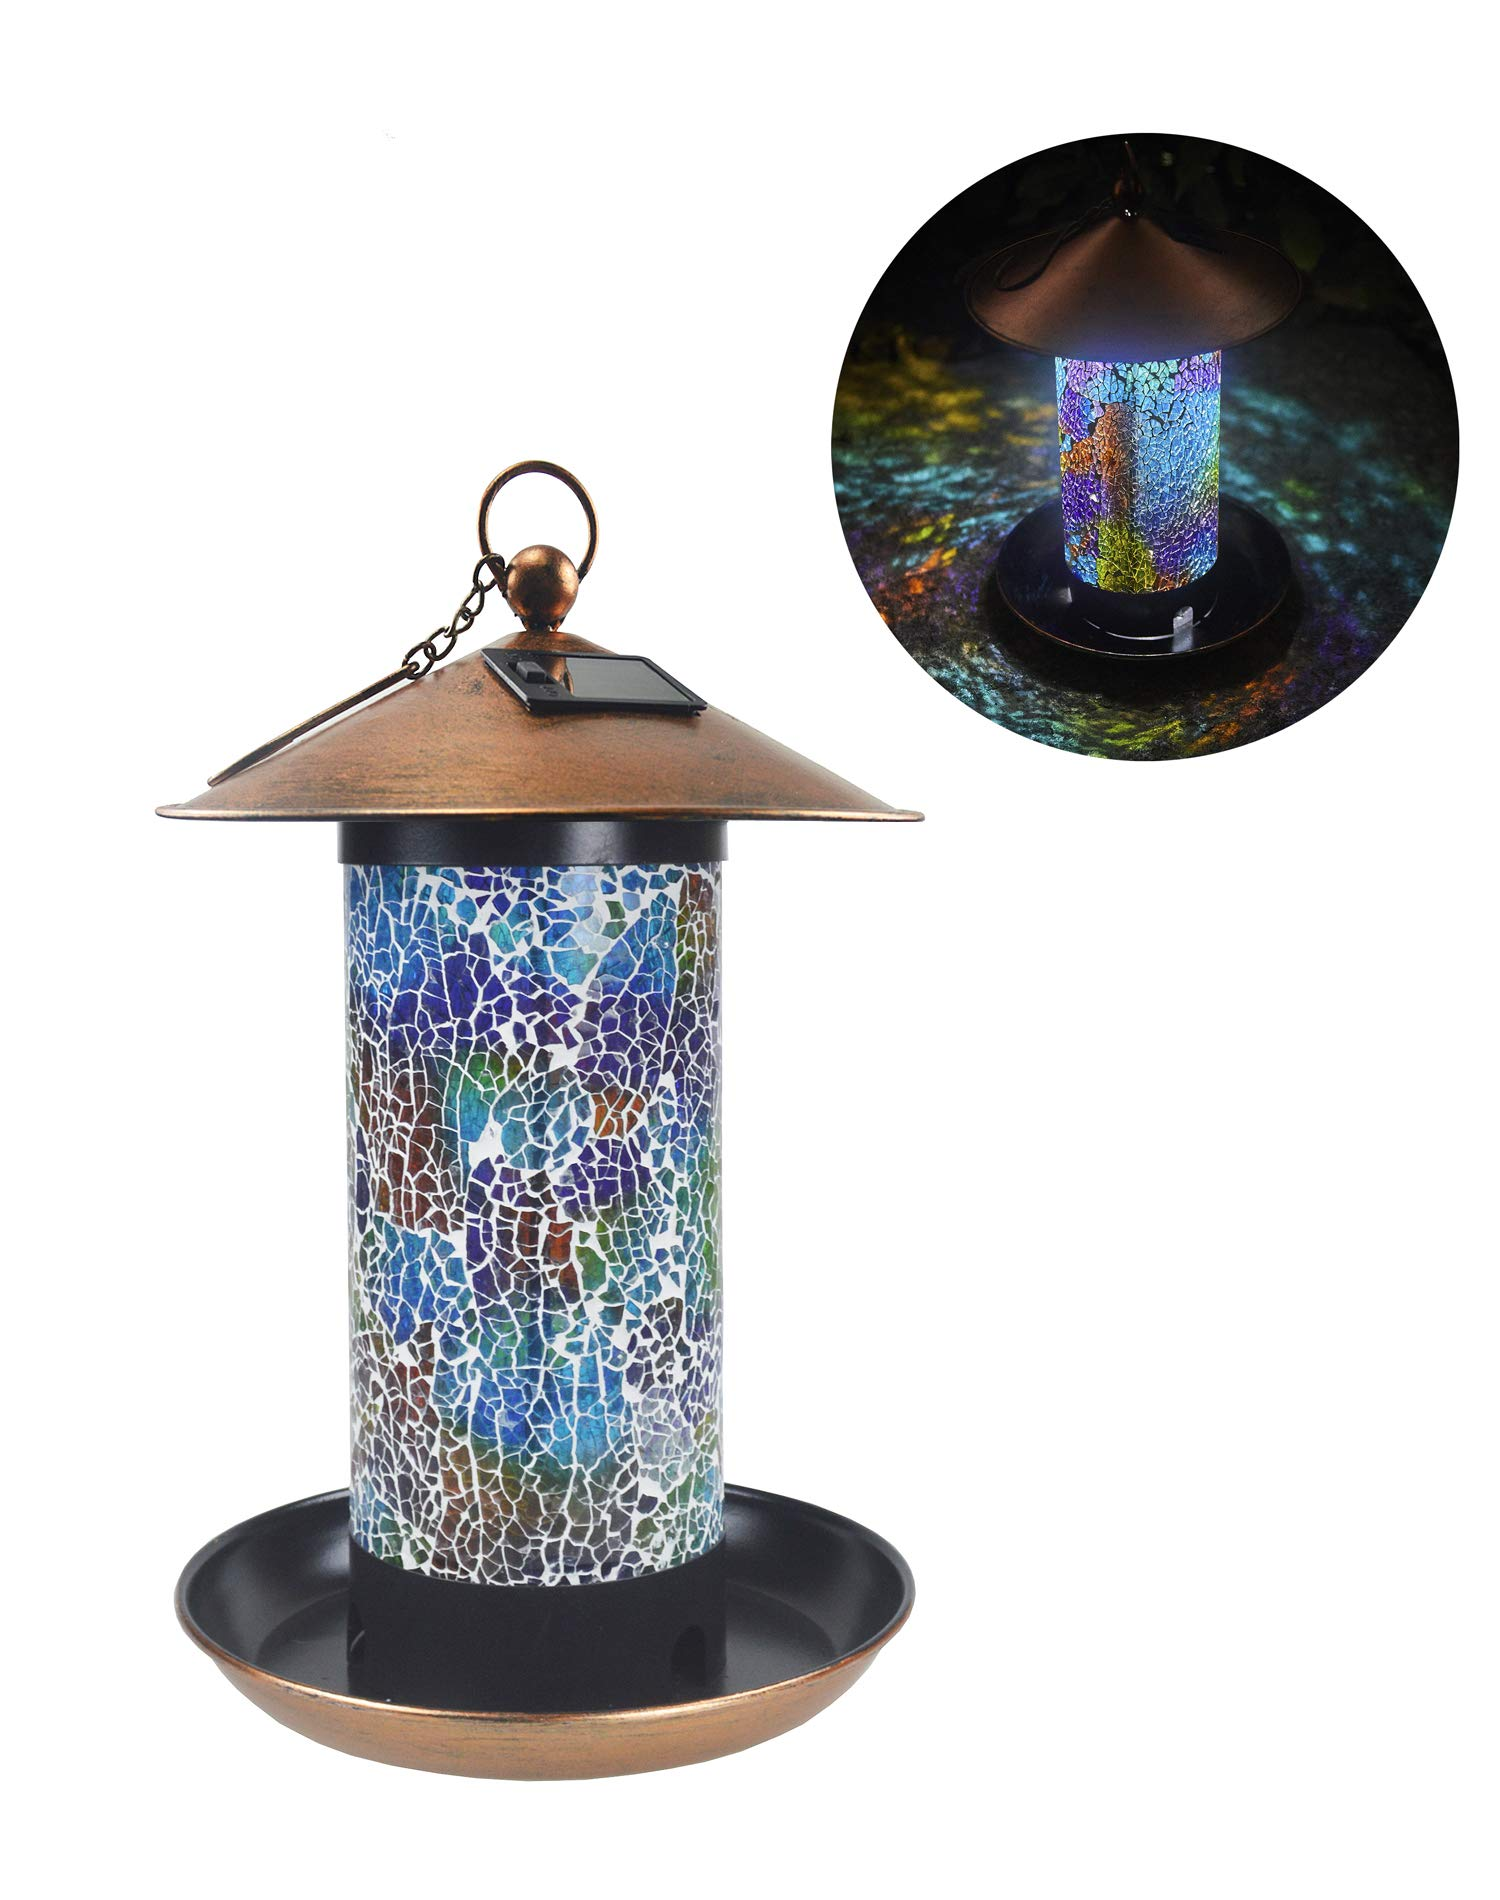 Sepfier Solar Power Energy Bird Feeder Outdoor Hanging Handcrafted Mosaic Glass LED Garden Light Waterproof Unique Gift (Blue)